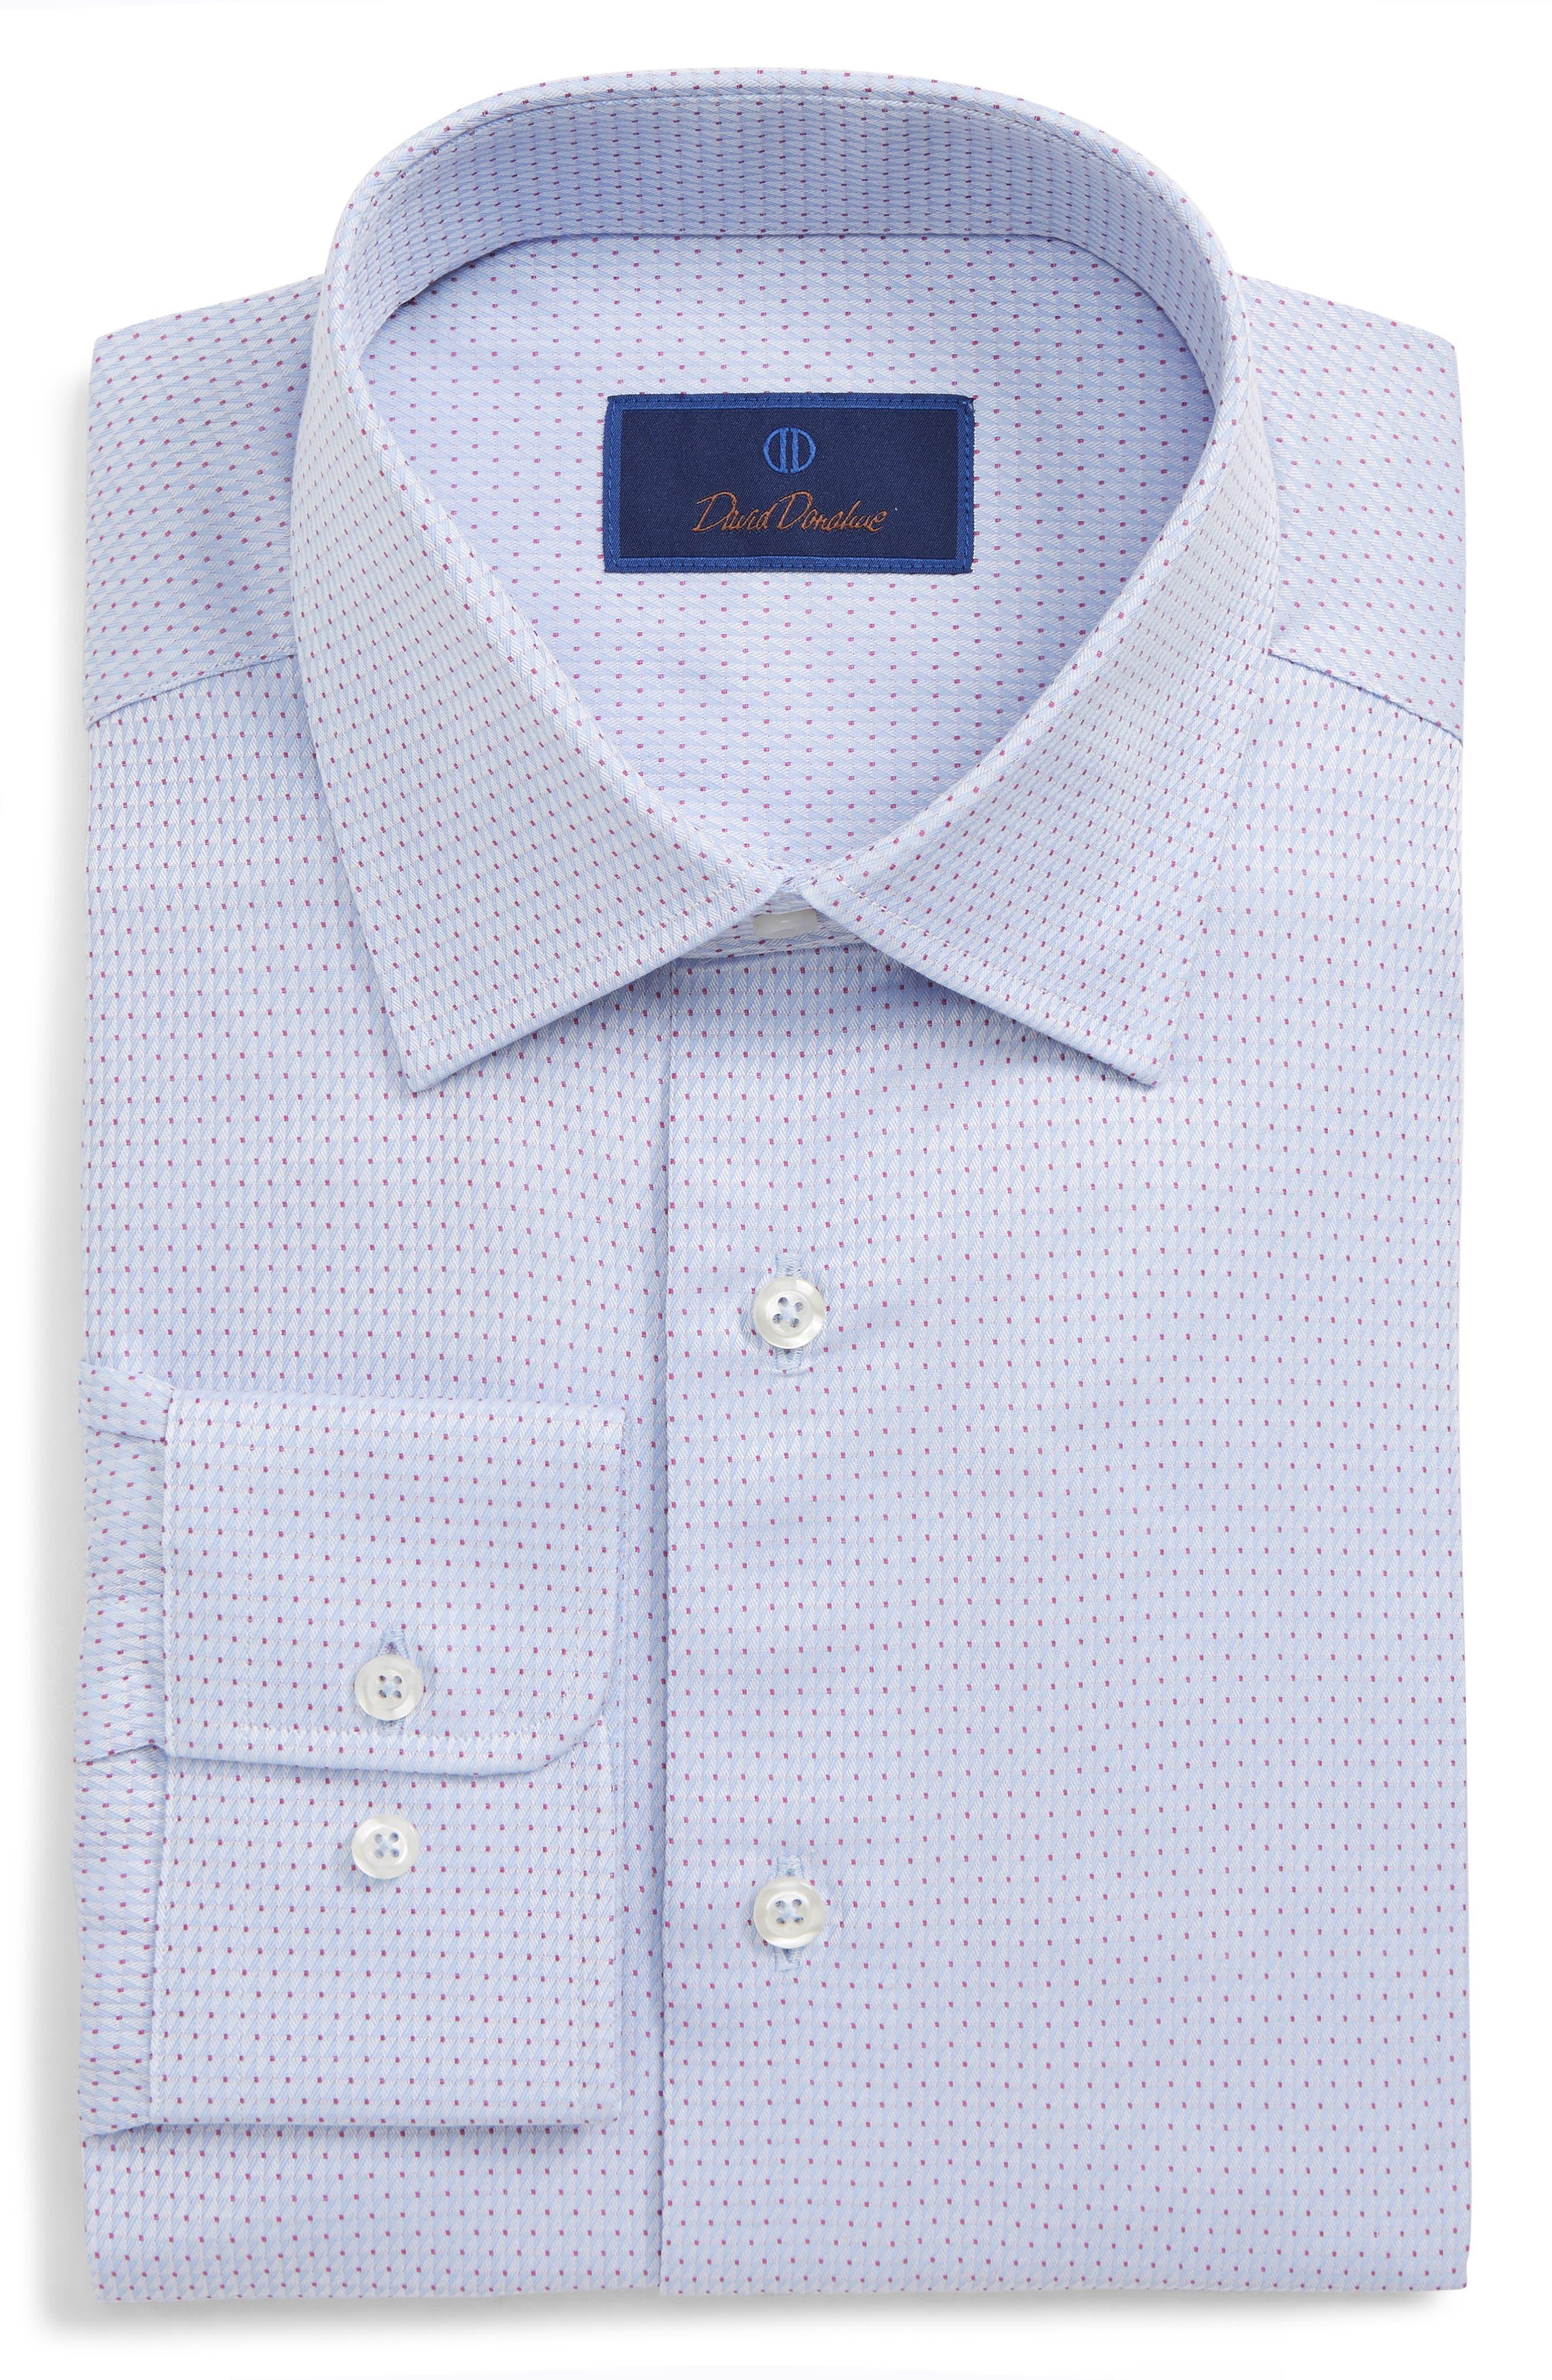 Regular Fit Geometric Dress Shirt,                         Main,                         color, SKY/ BERRY